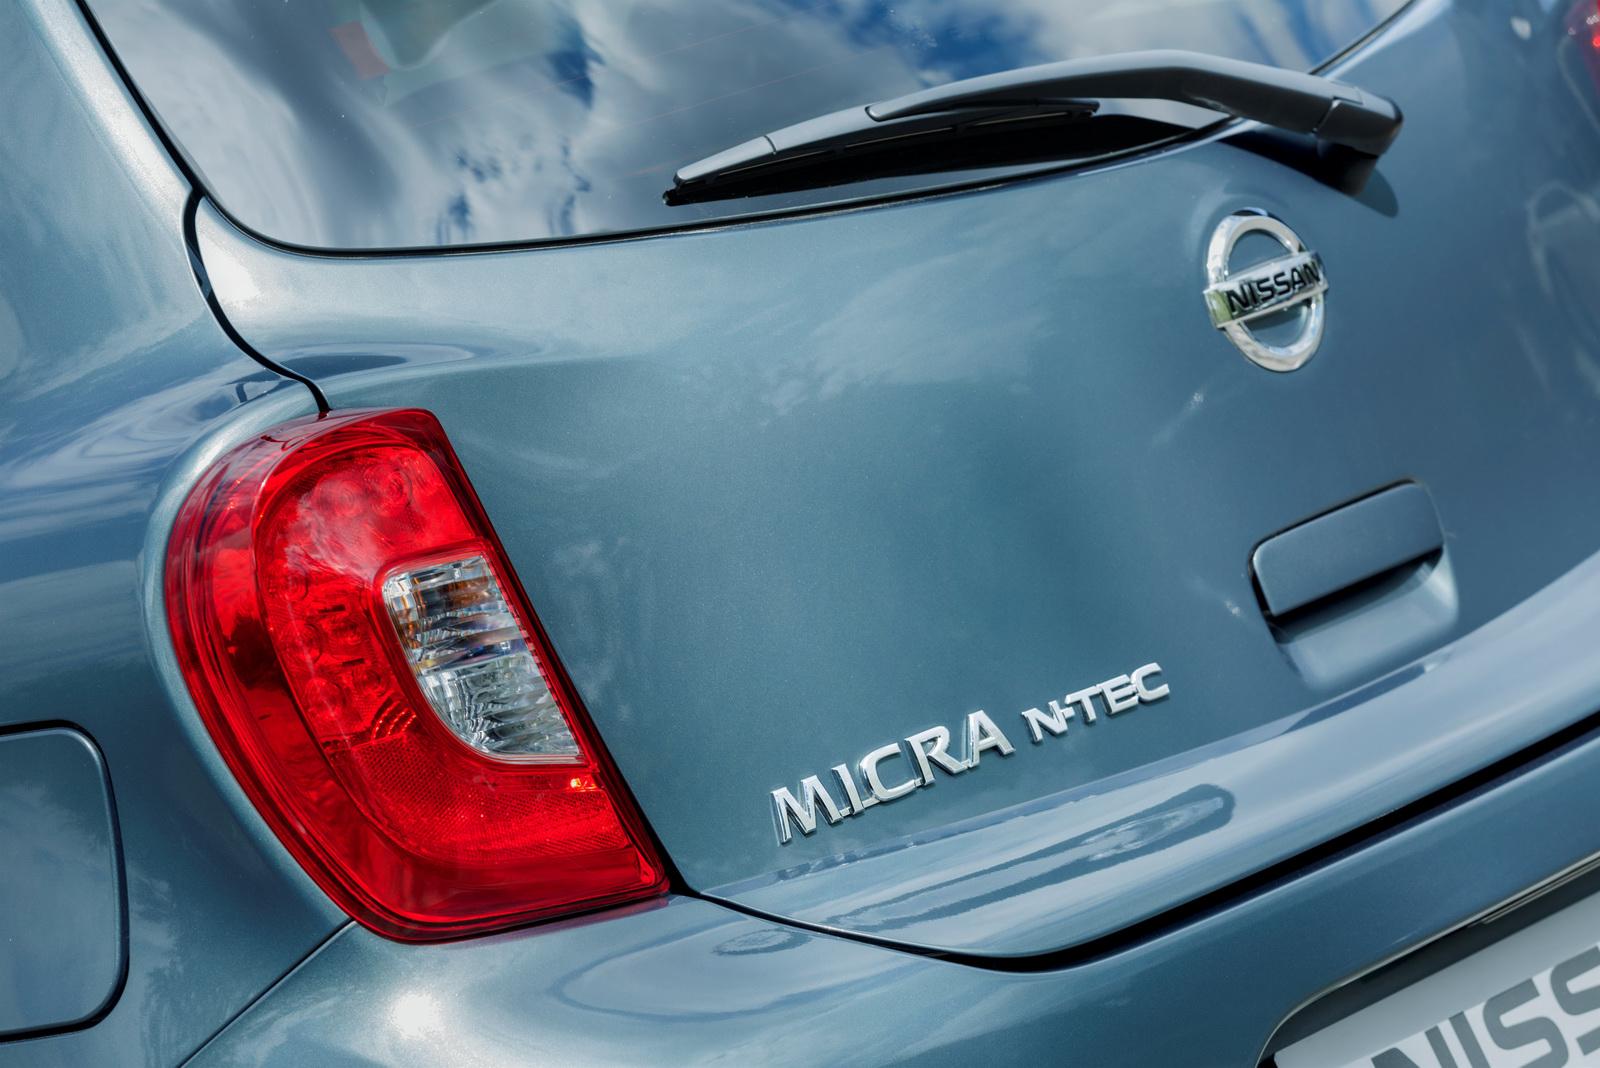 Nissan-Micra-N-Tec-5